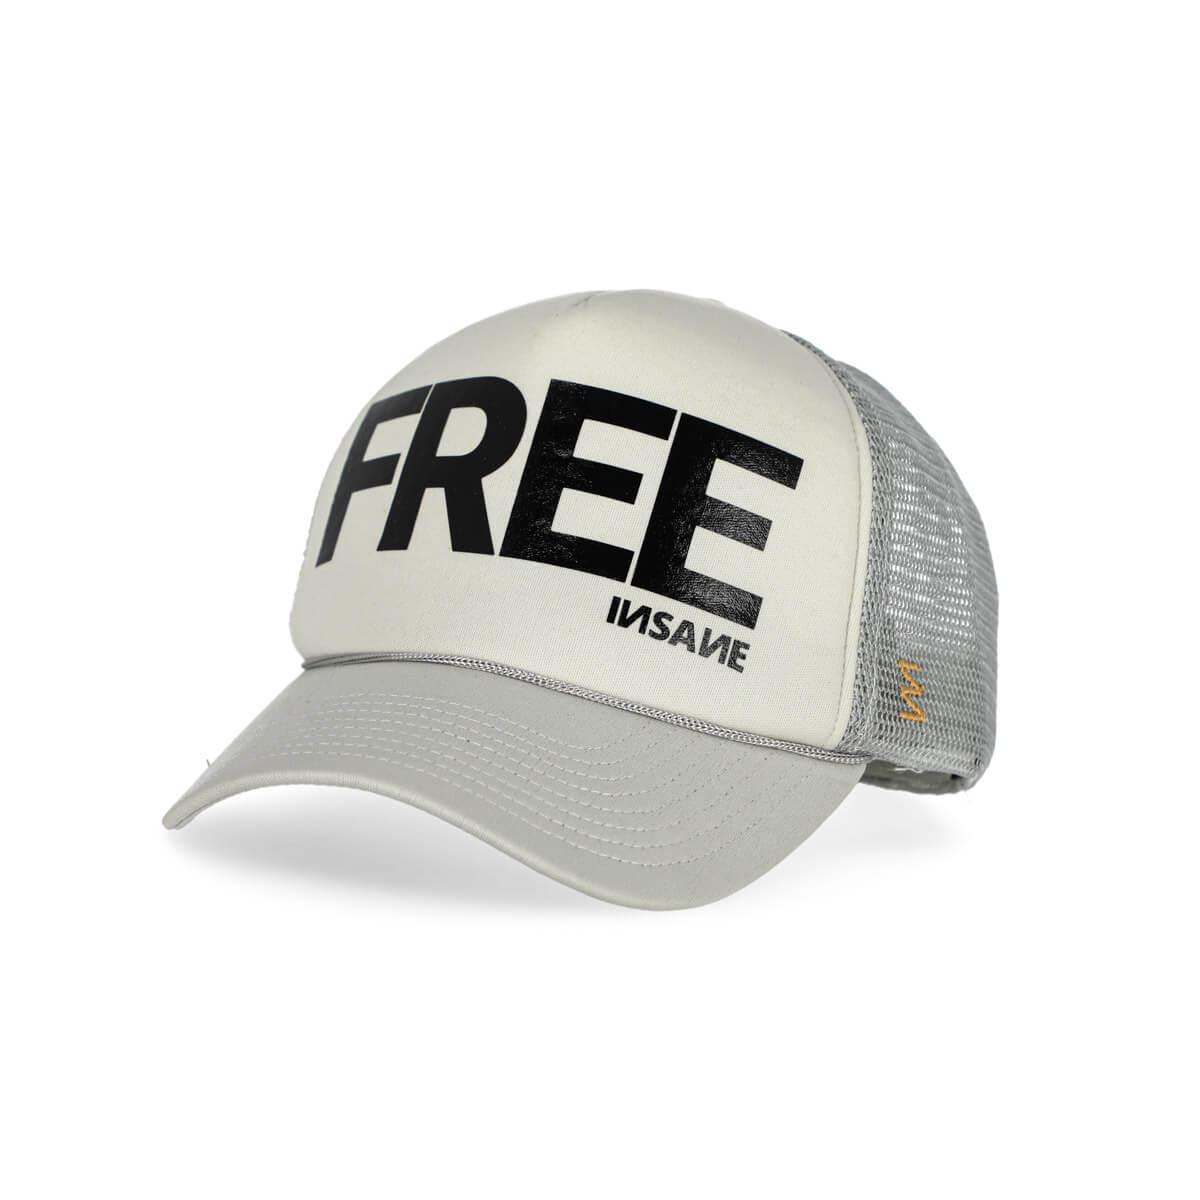 Gorra FREE trucker INSANE